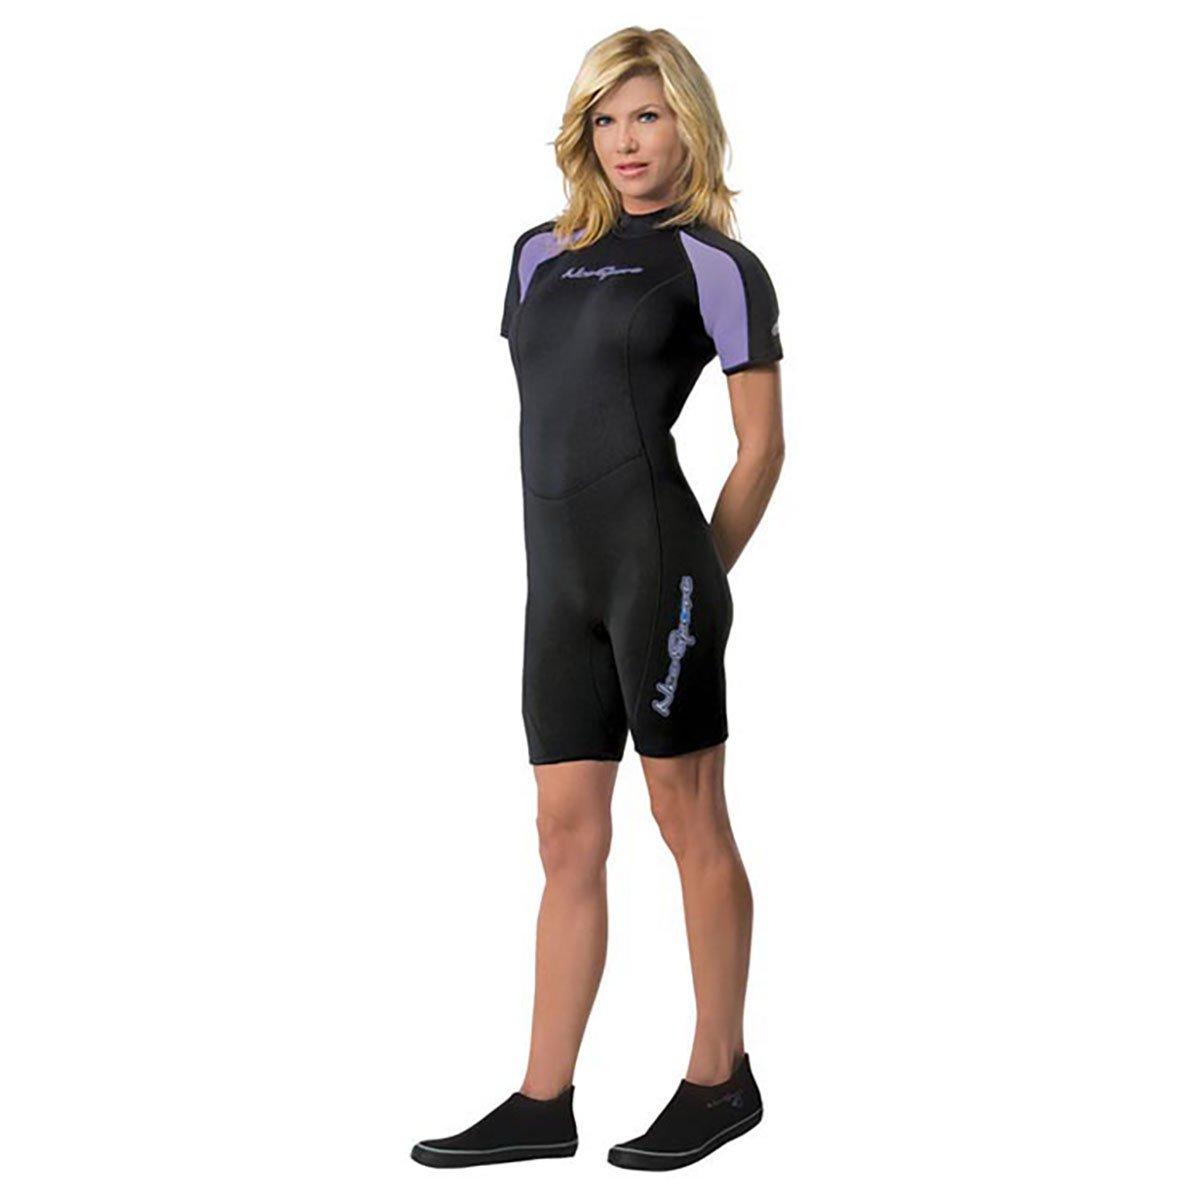 Amazon.com  NeoSport Wetsuits Women s Premium 2mm Neoprene Shorty  Sports    Outdoors de5e6e7a6